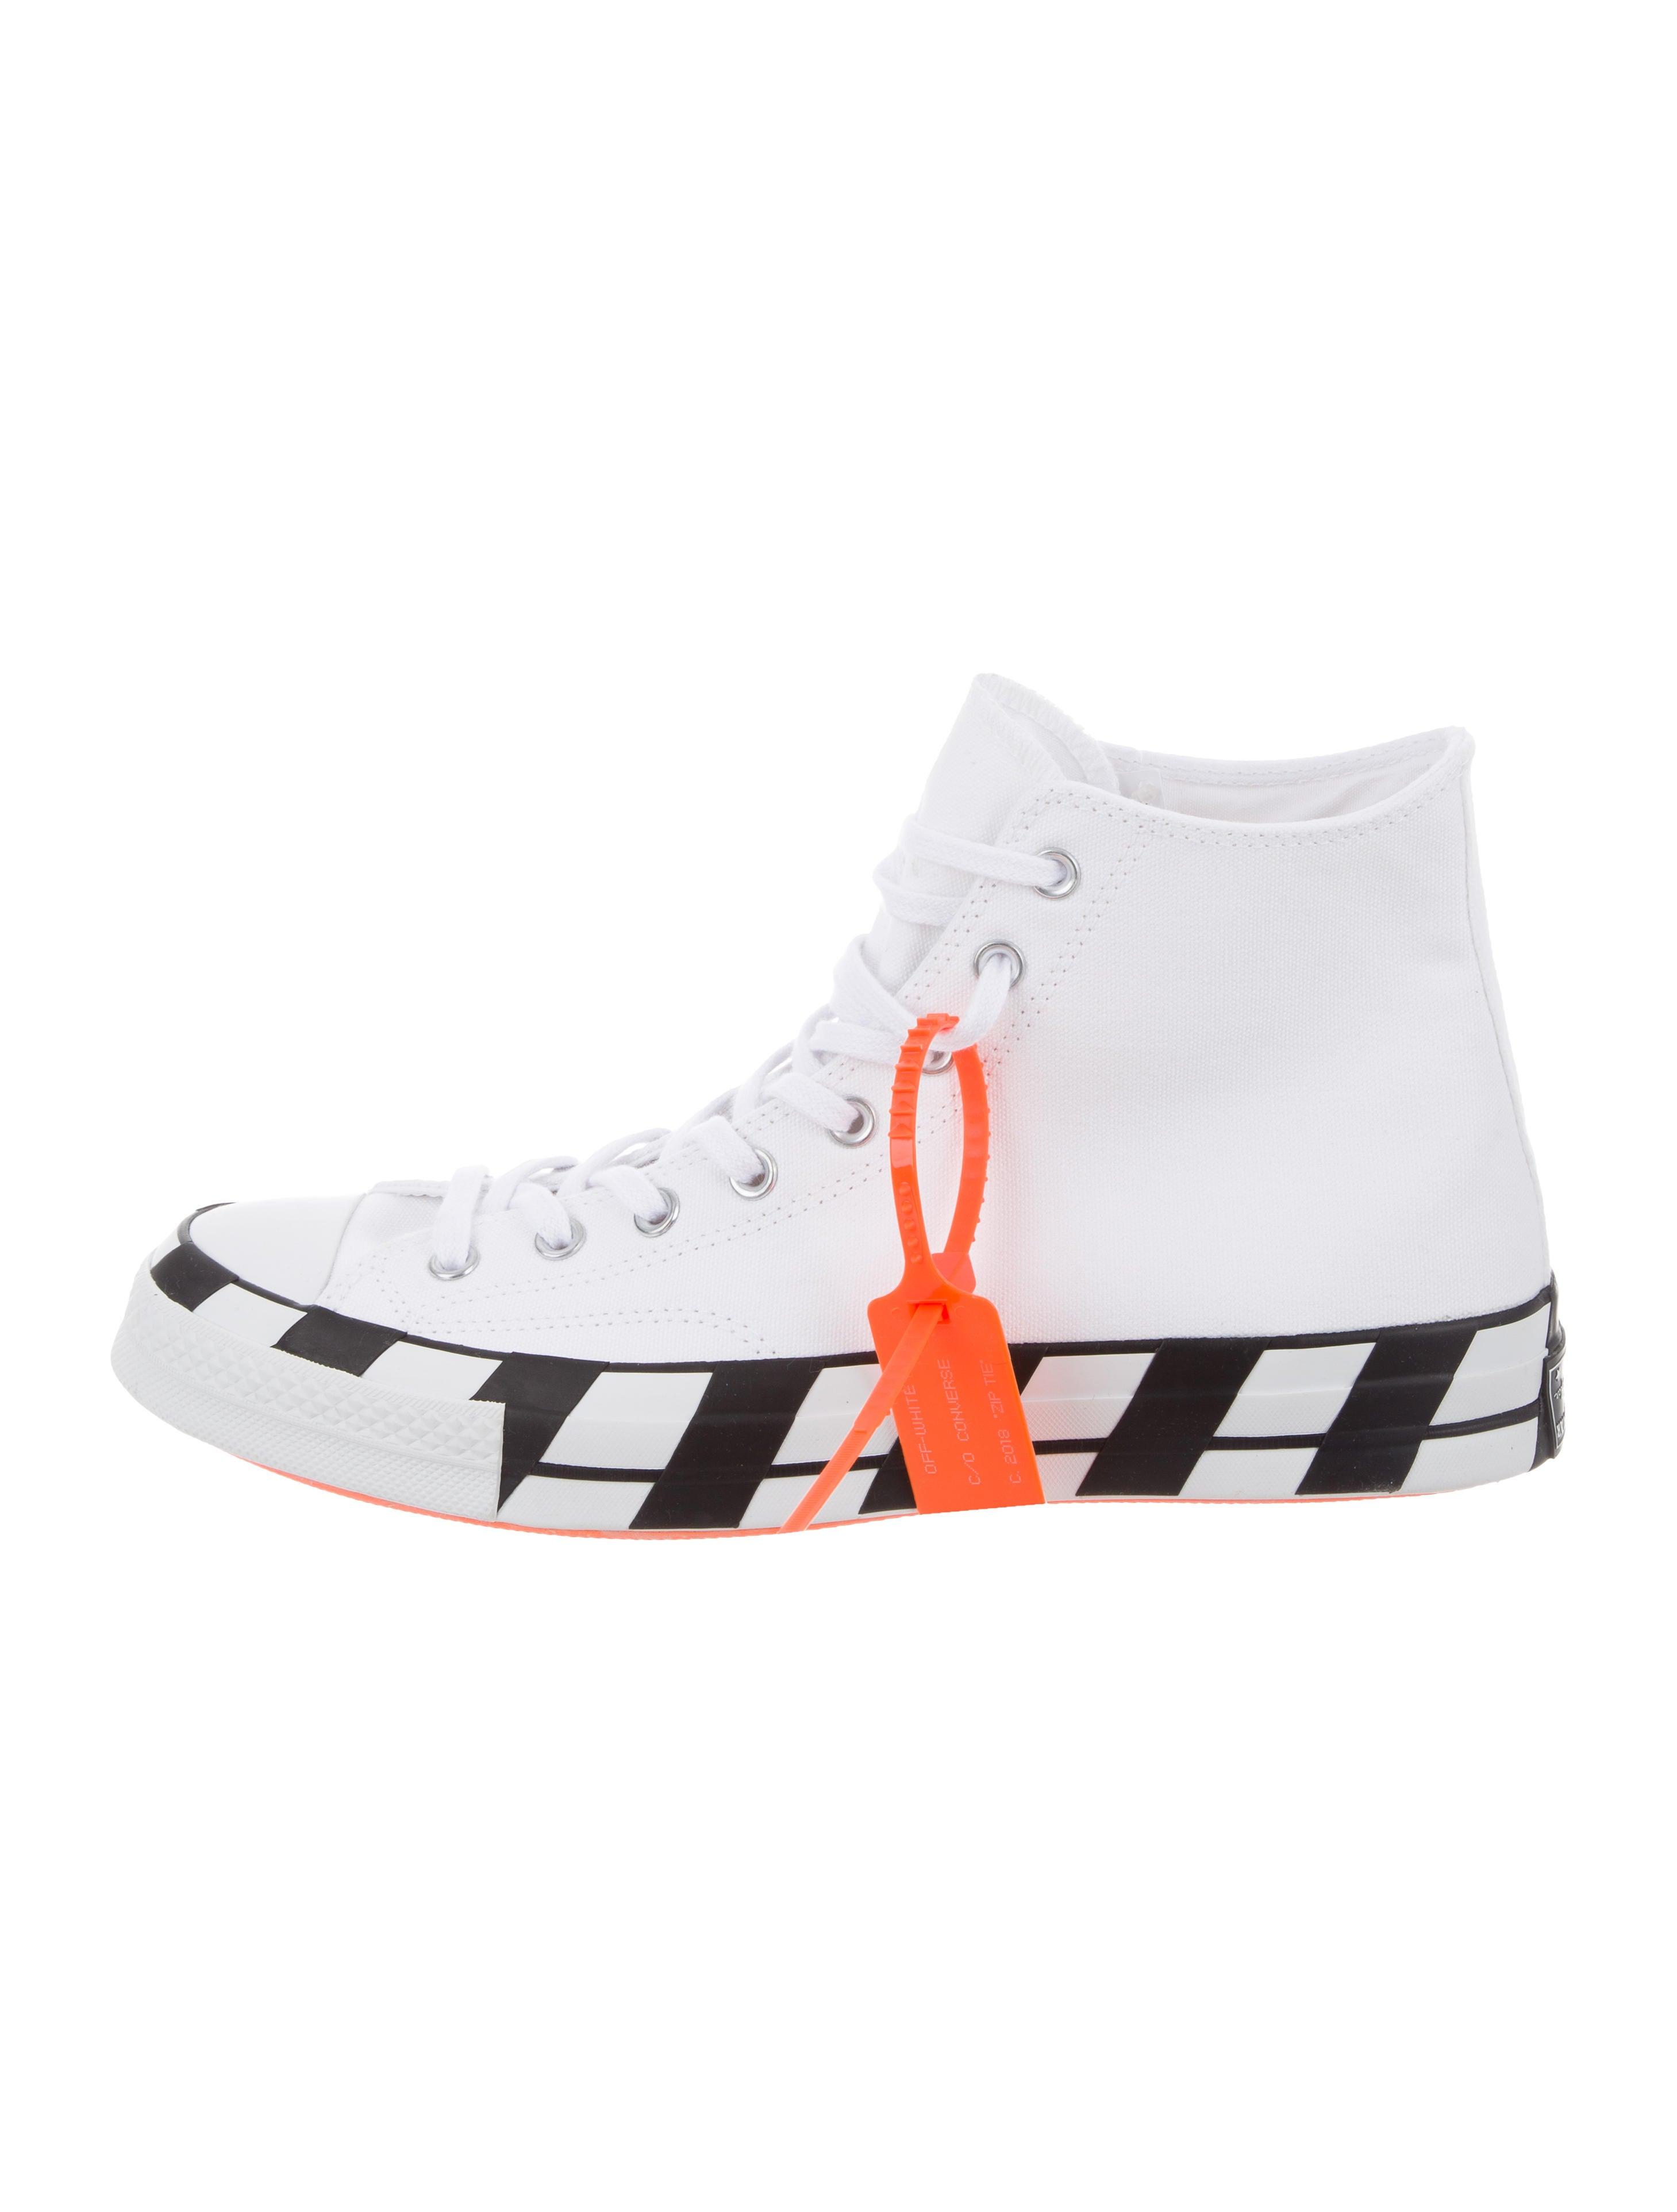 8b9ab5f3adf4 Off-White x Converse Chuck Taylor All Star 70 Hi Sneakers w  Tags ...